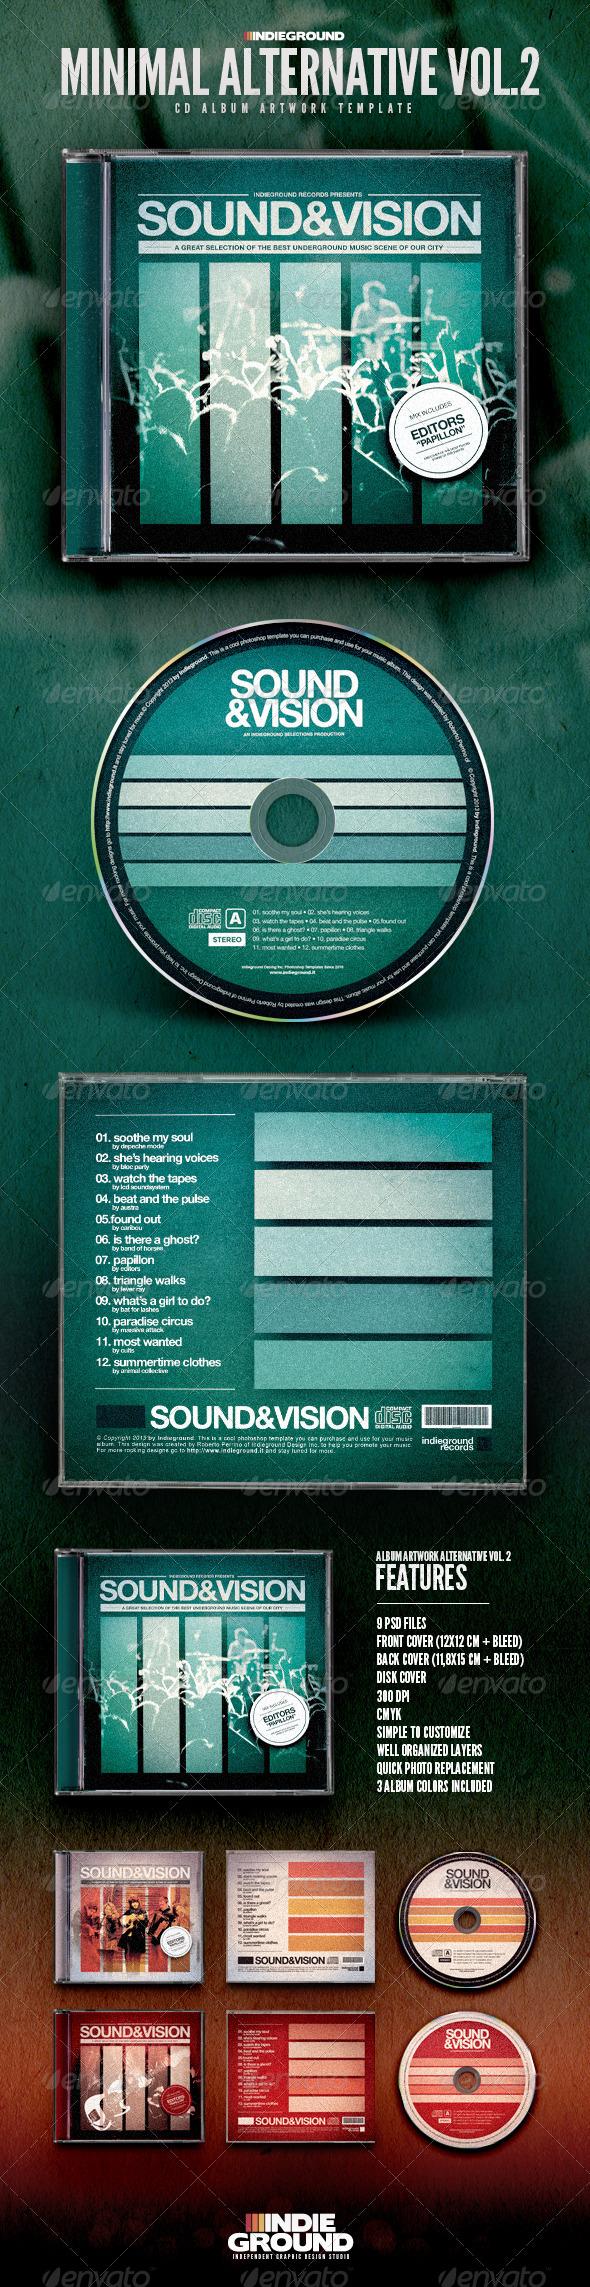 Cd disk artwork clipart transparent Pinterest • The world's catalog of ideas clipart transparent